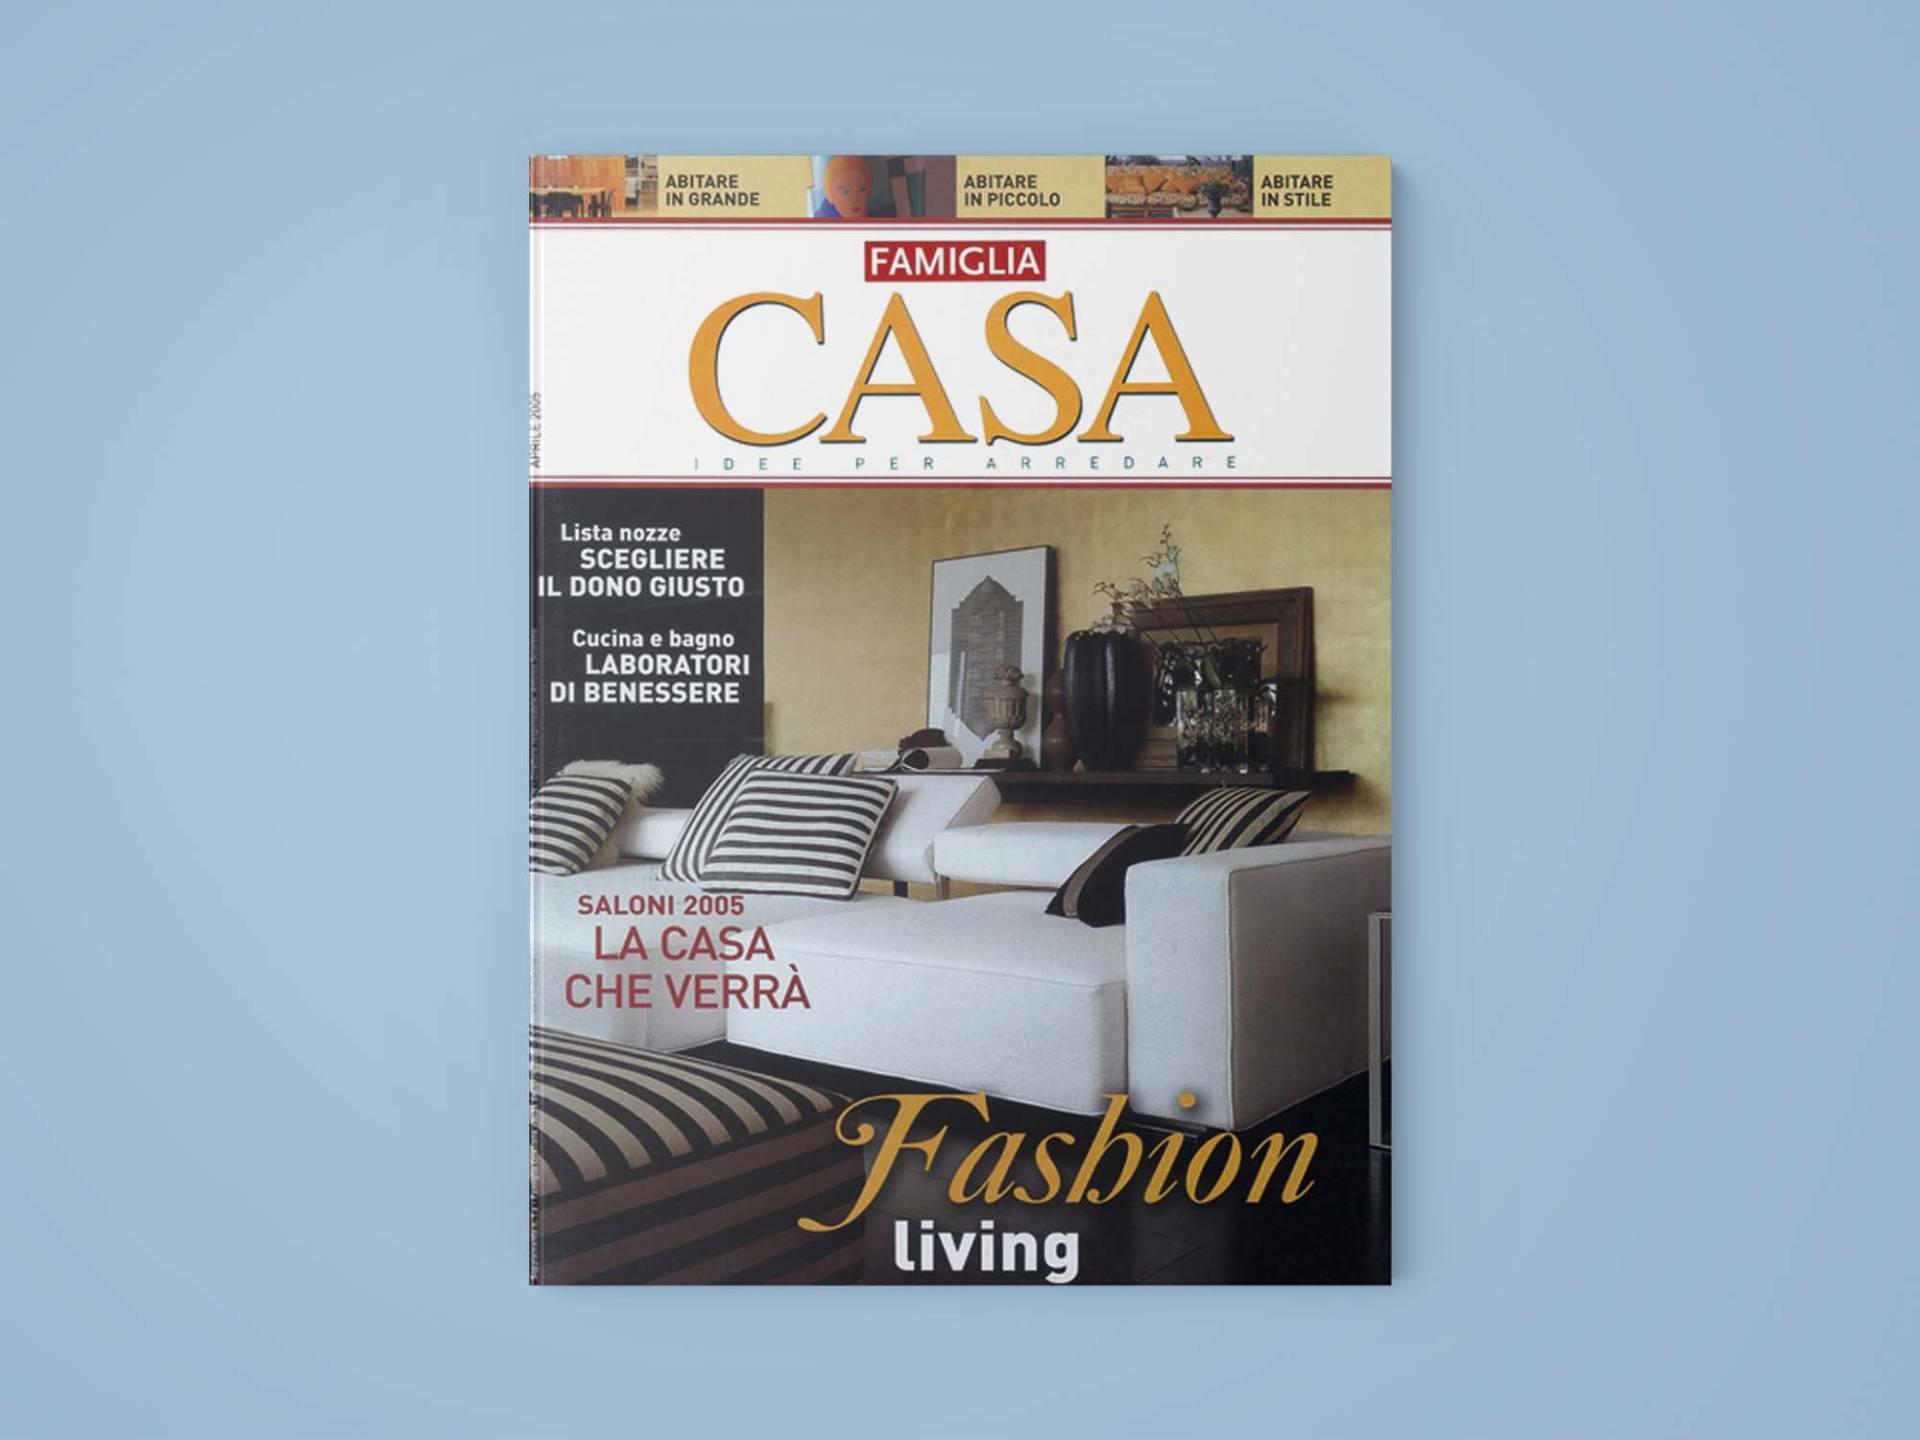 Famiglia_Casa_01_Wenceslau_News_Design